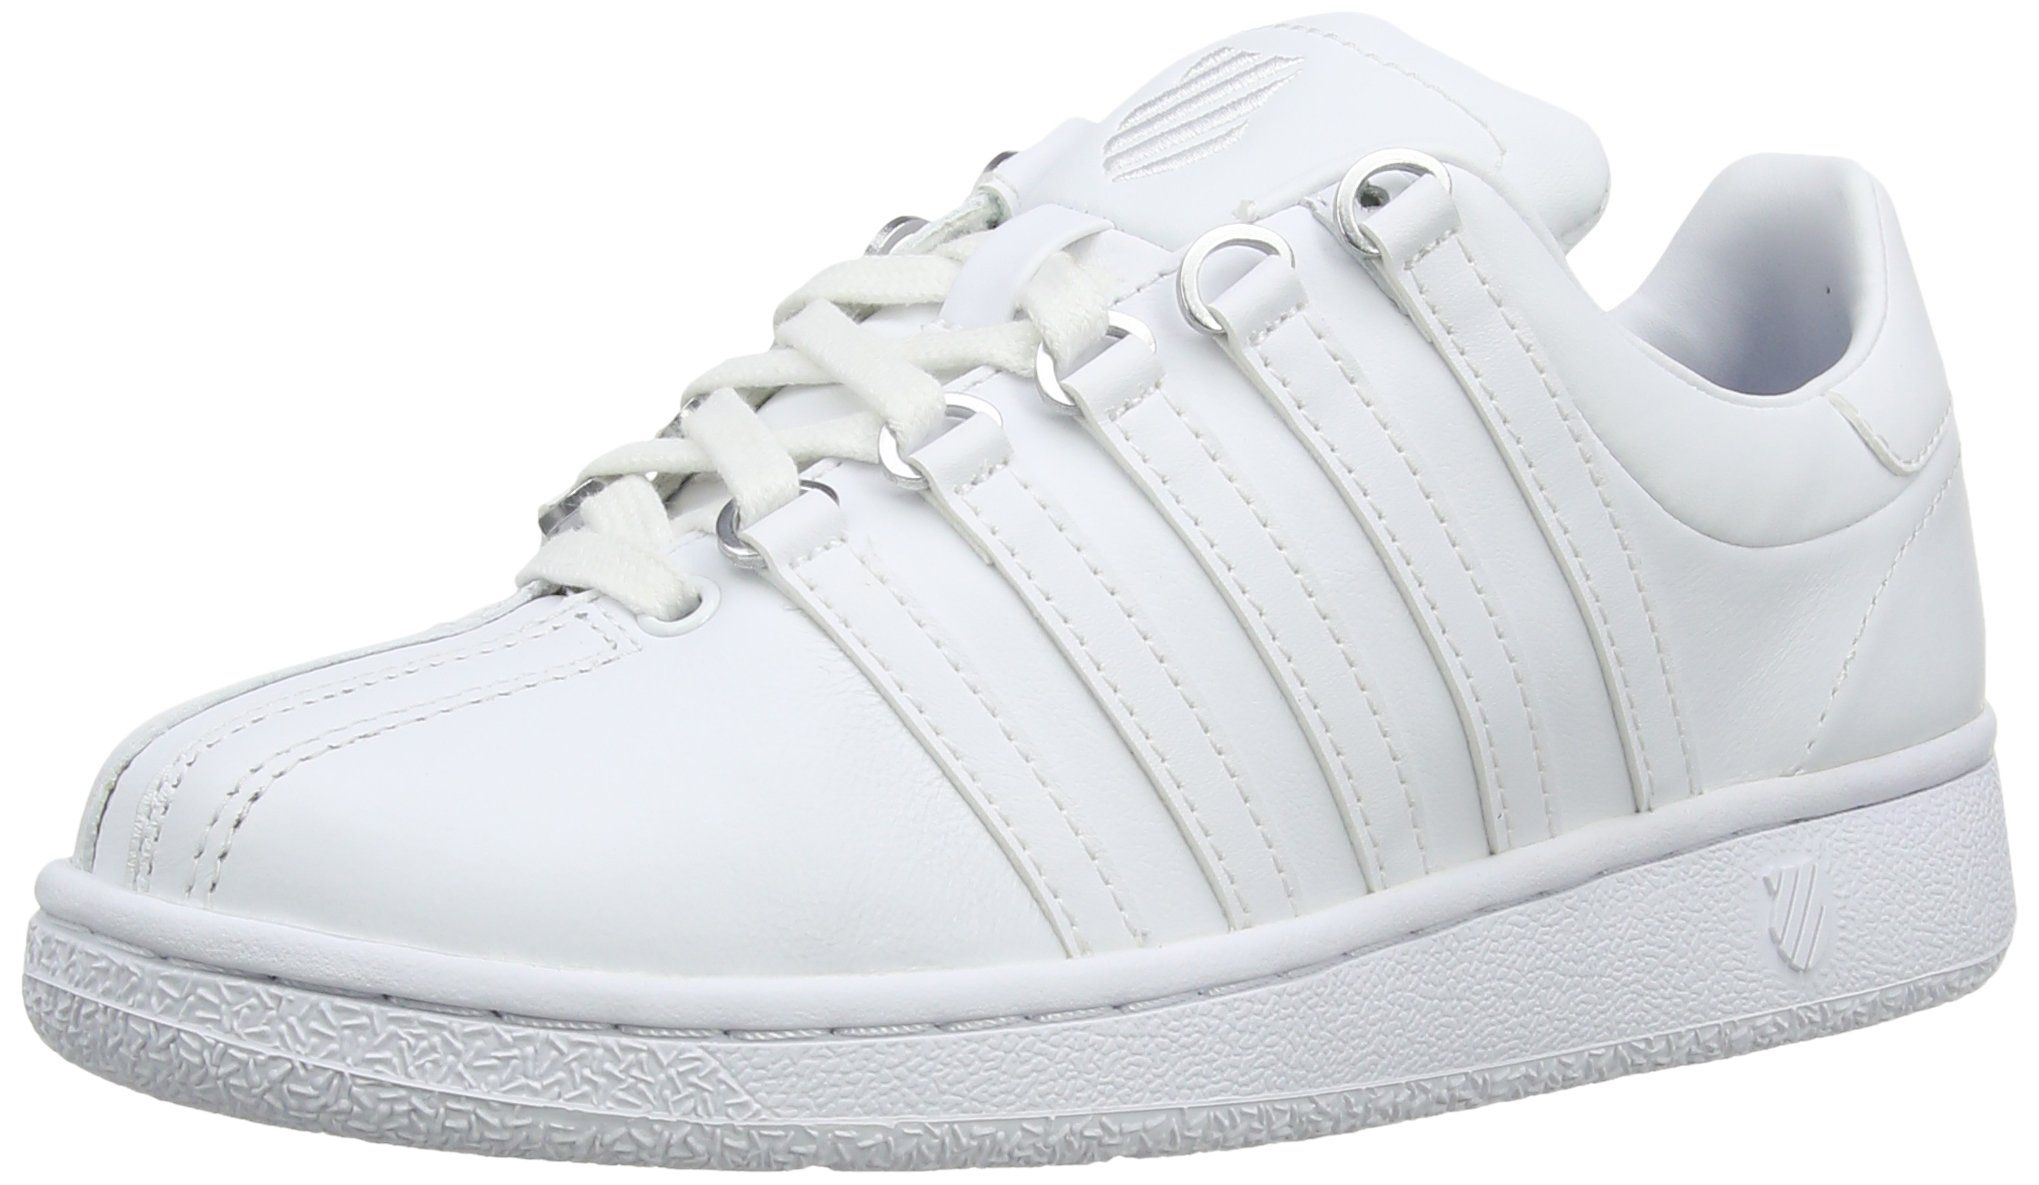 K-Swiss Women's Classic VN Lifestyle Sneaker, White/White, 8.5 M US